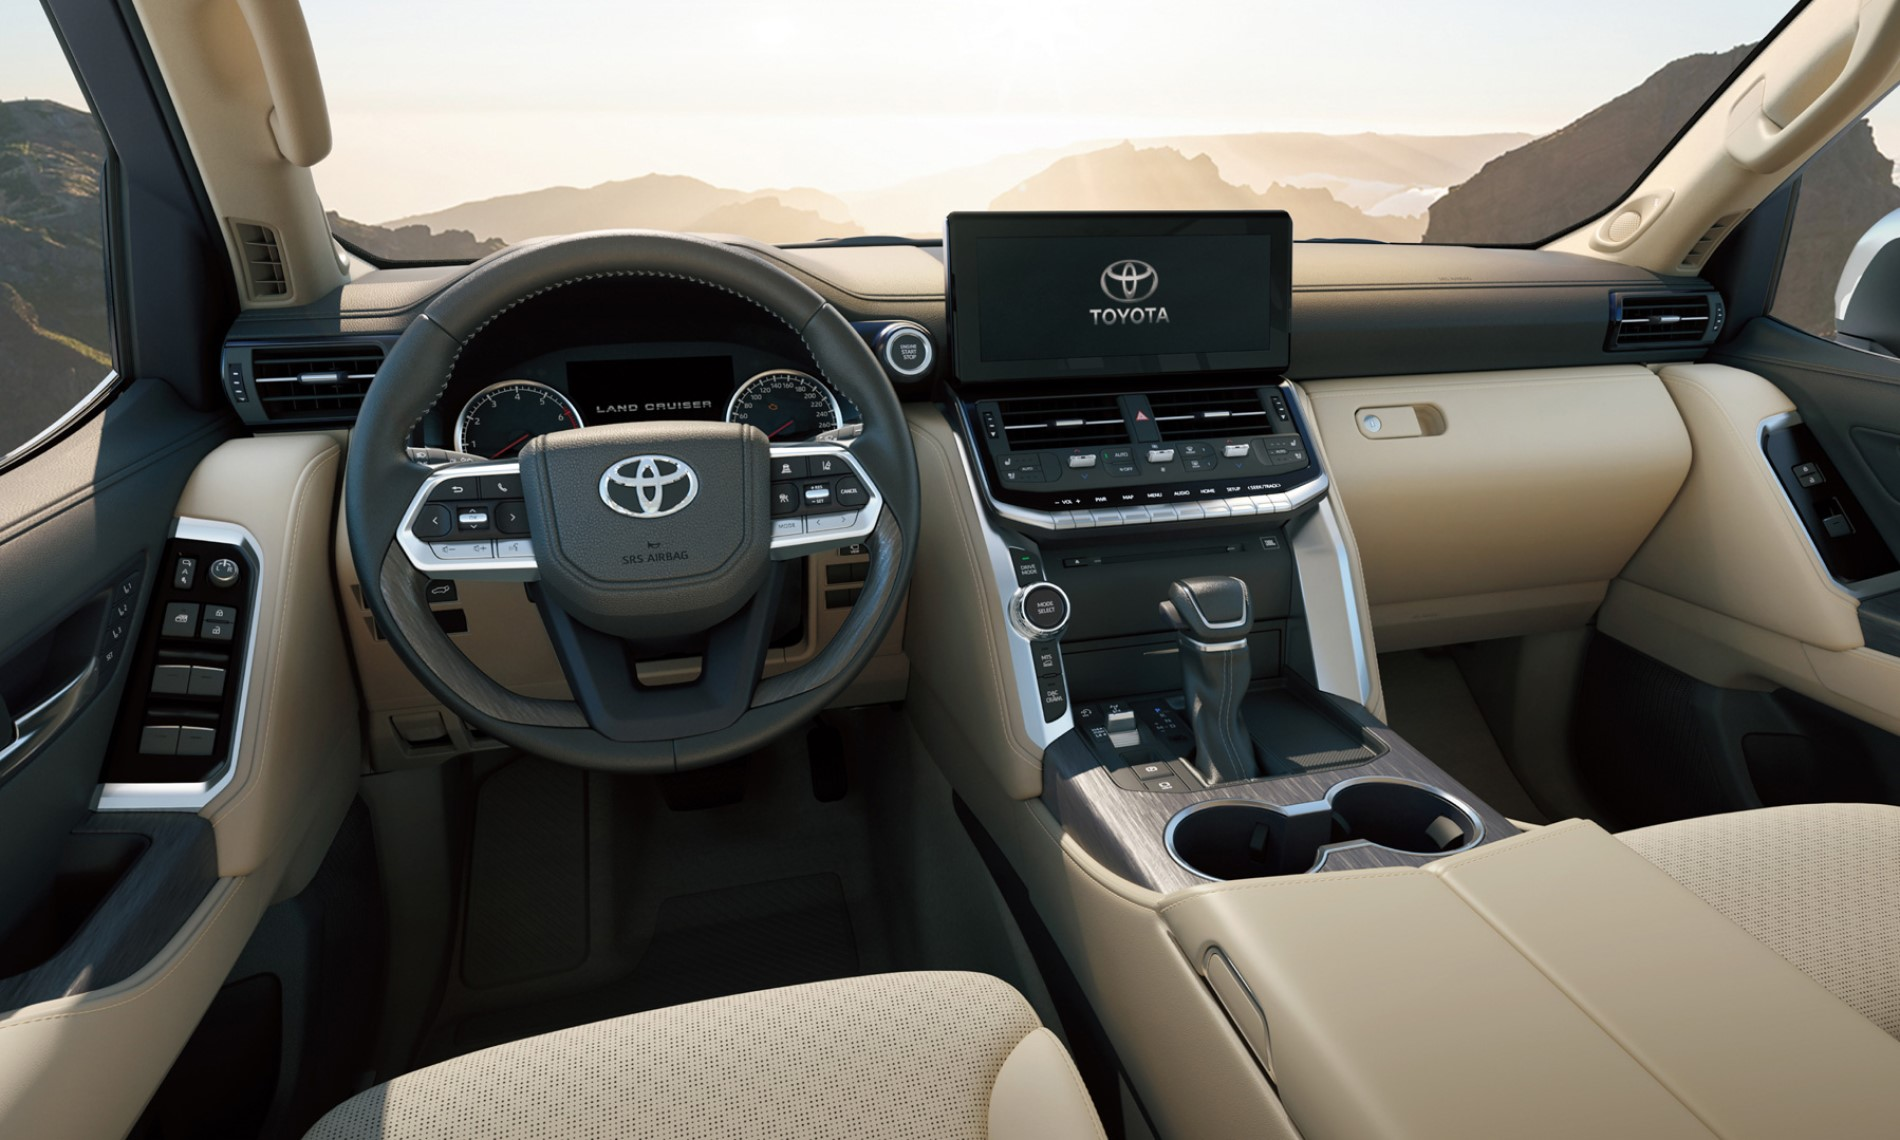 Toyota Land Cruiser 300 interior